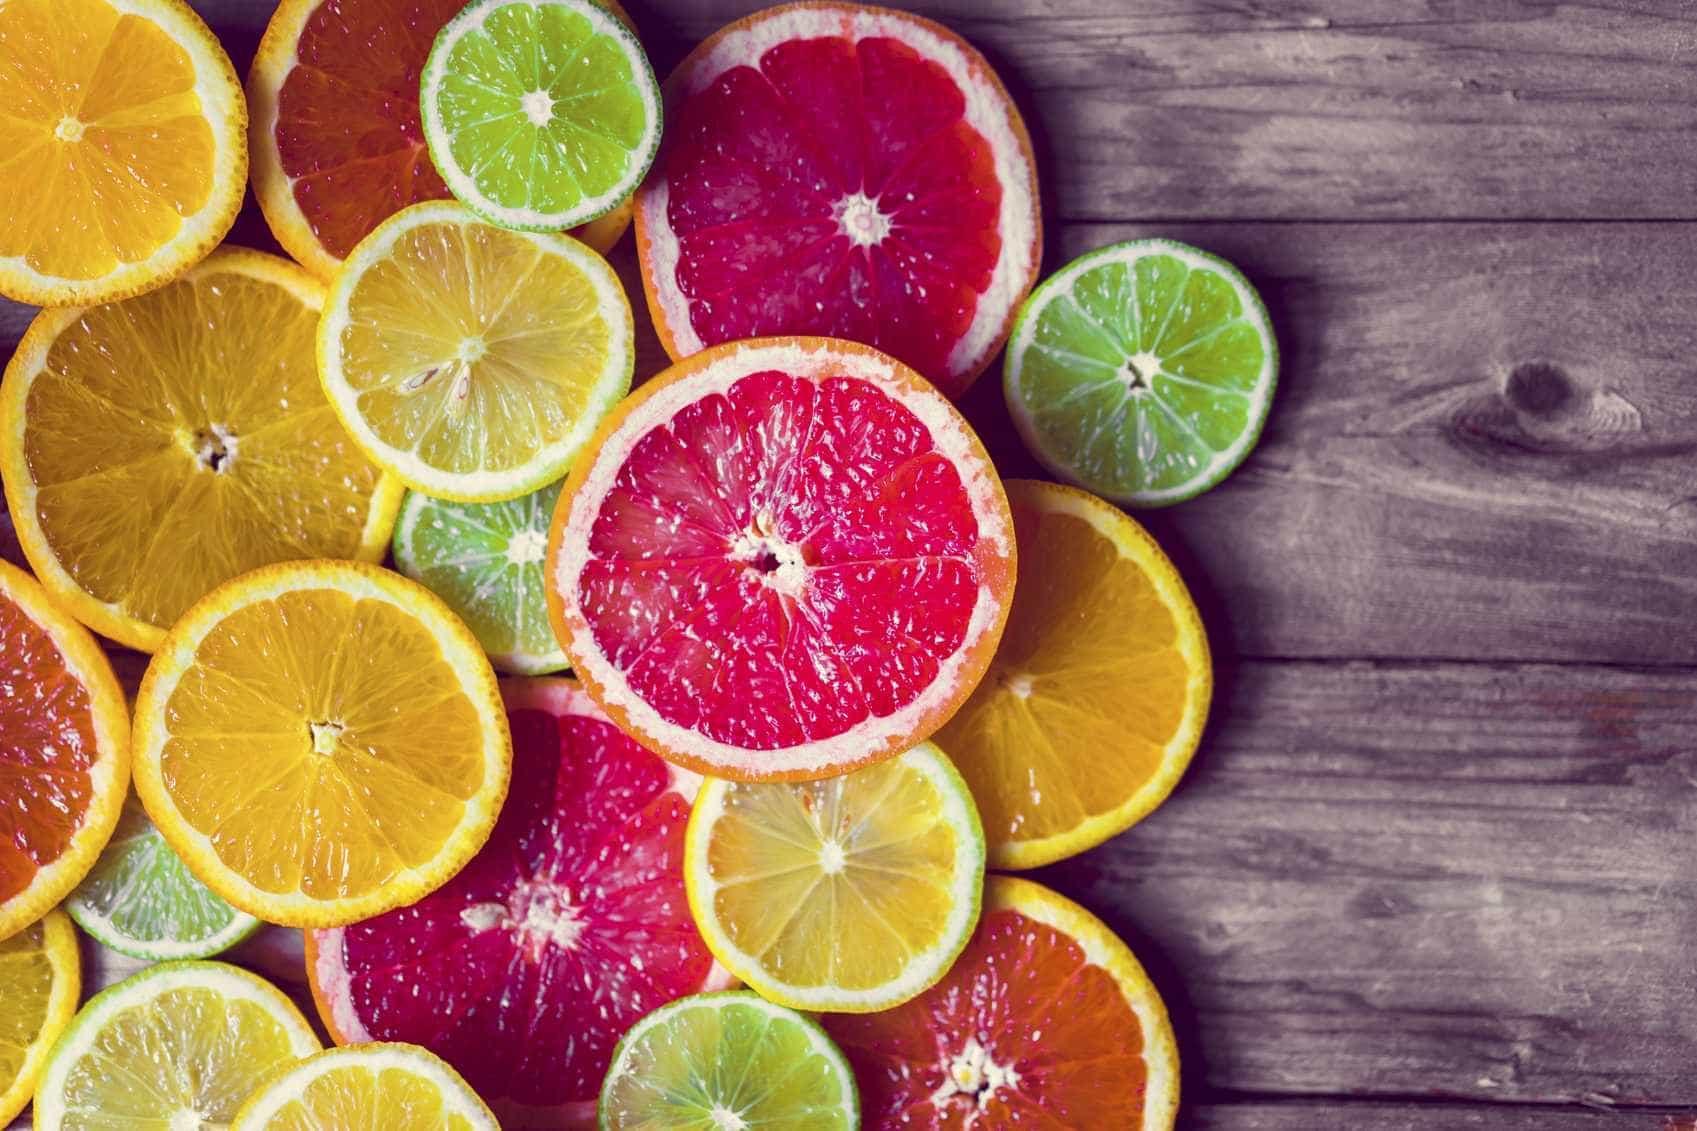 Os alimentos que deve evitar para ter uns dentes bonitos